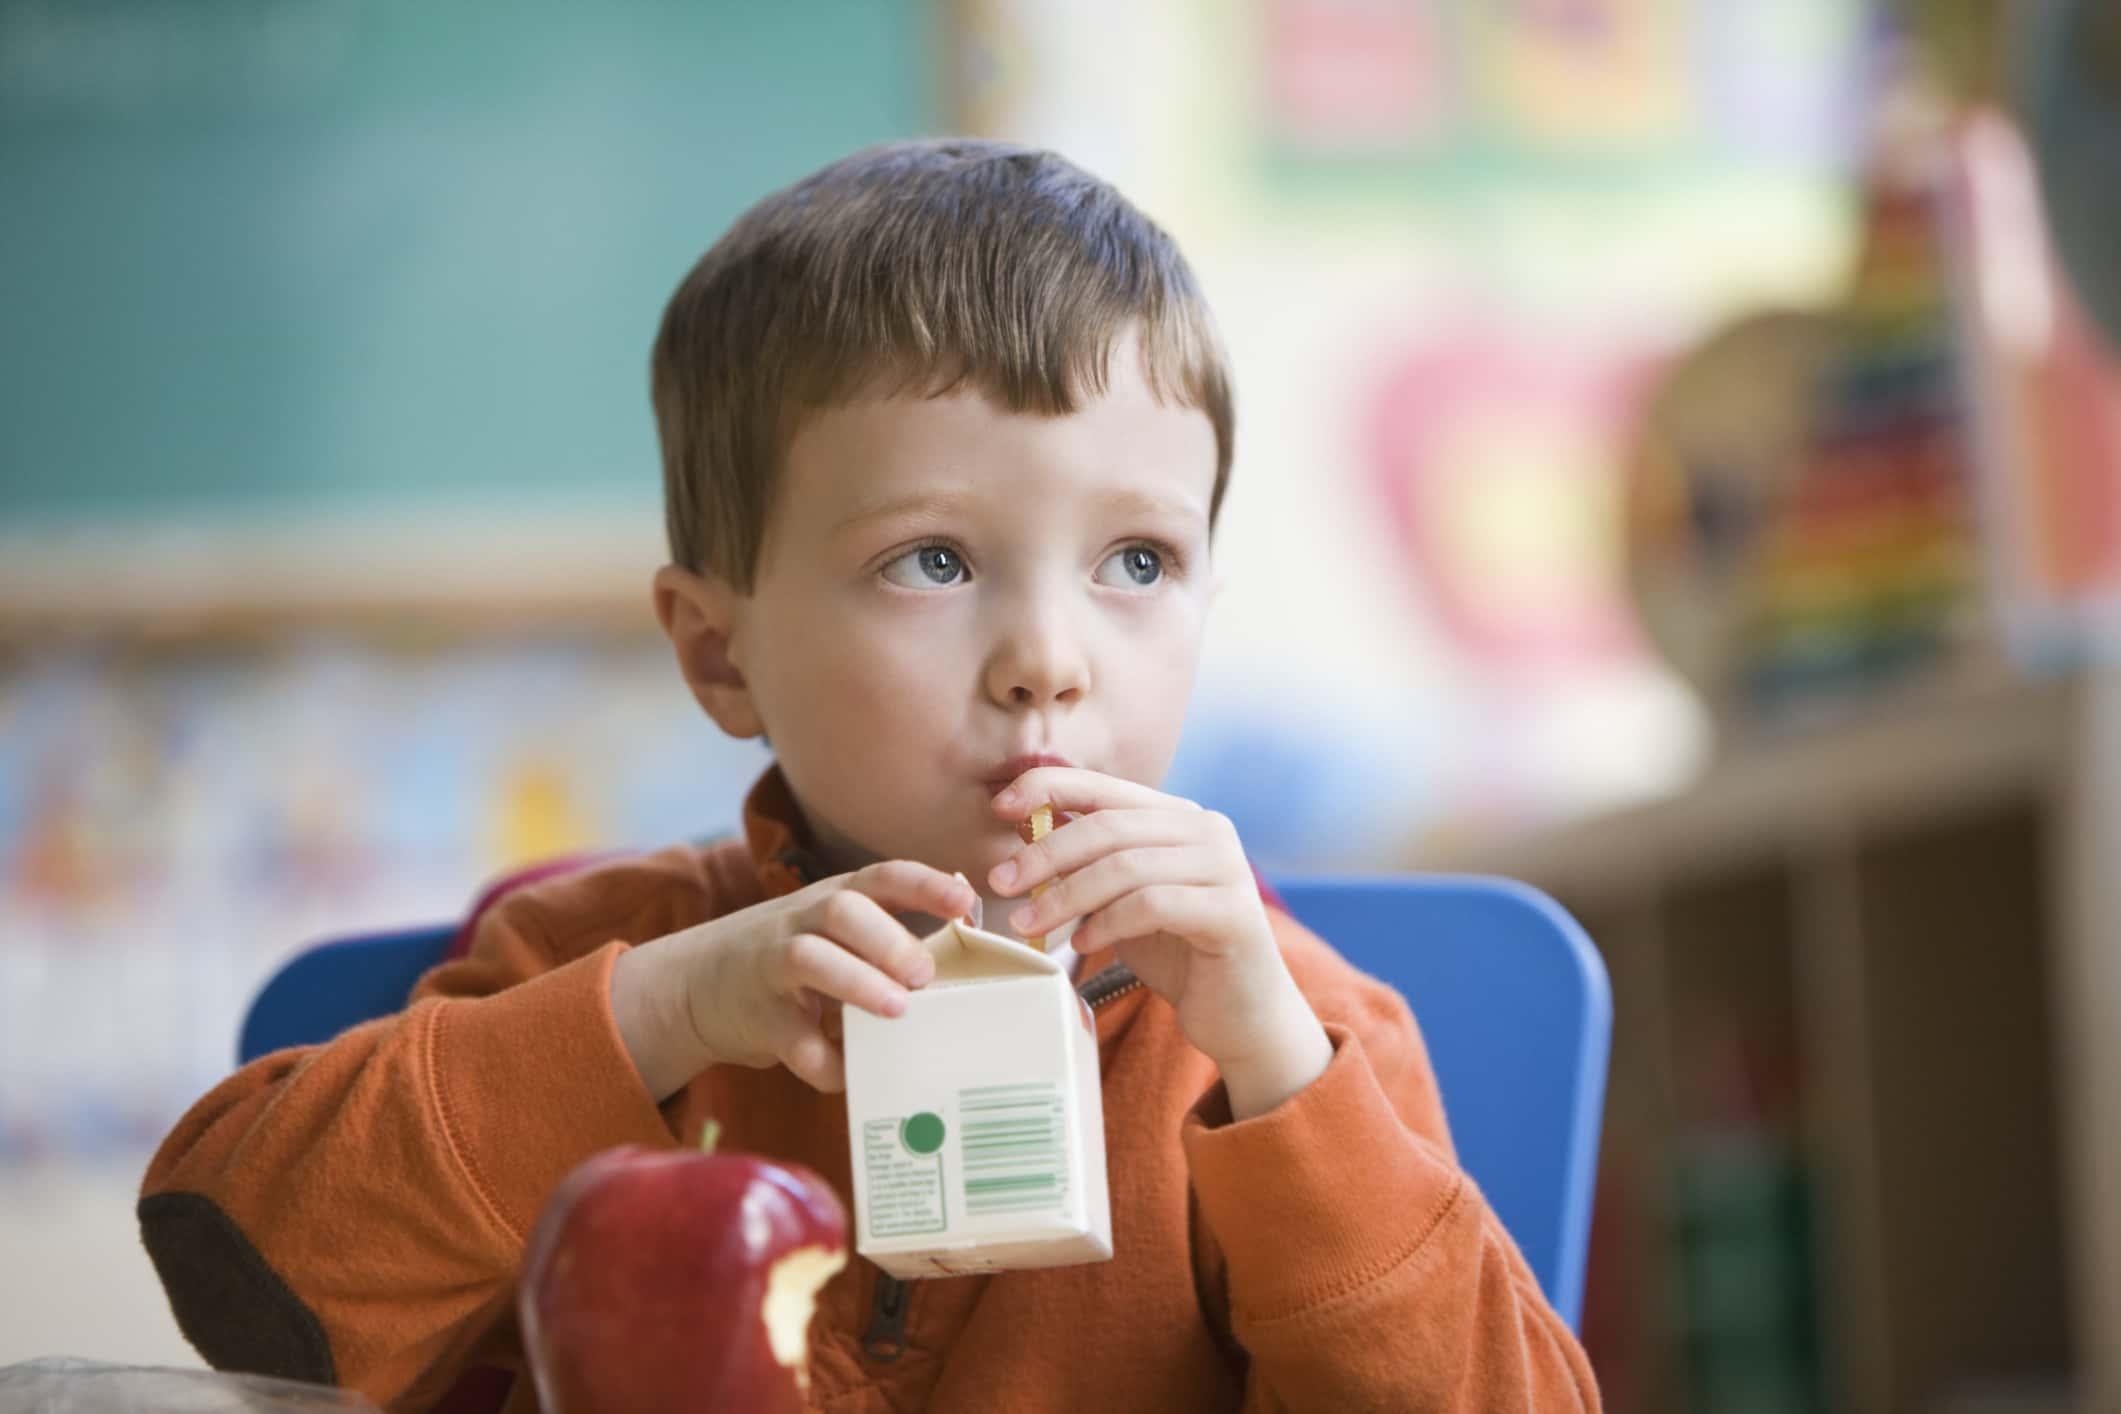 Milk carton kid editorial